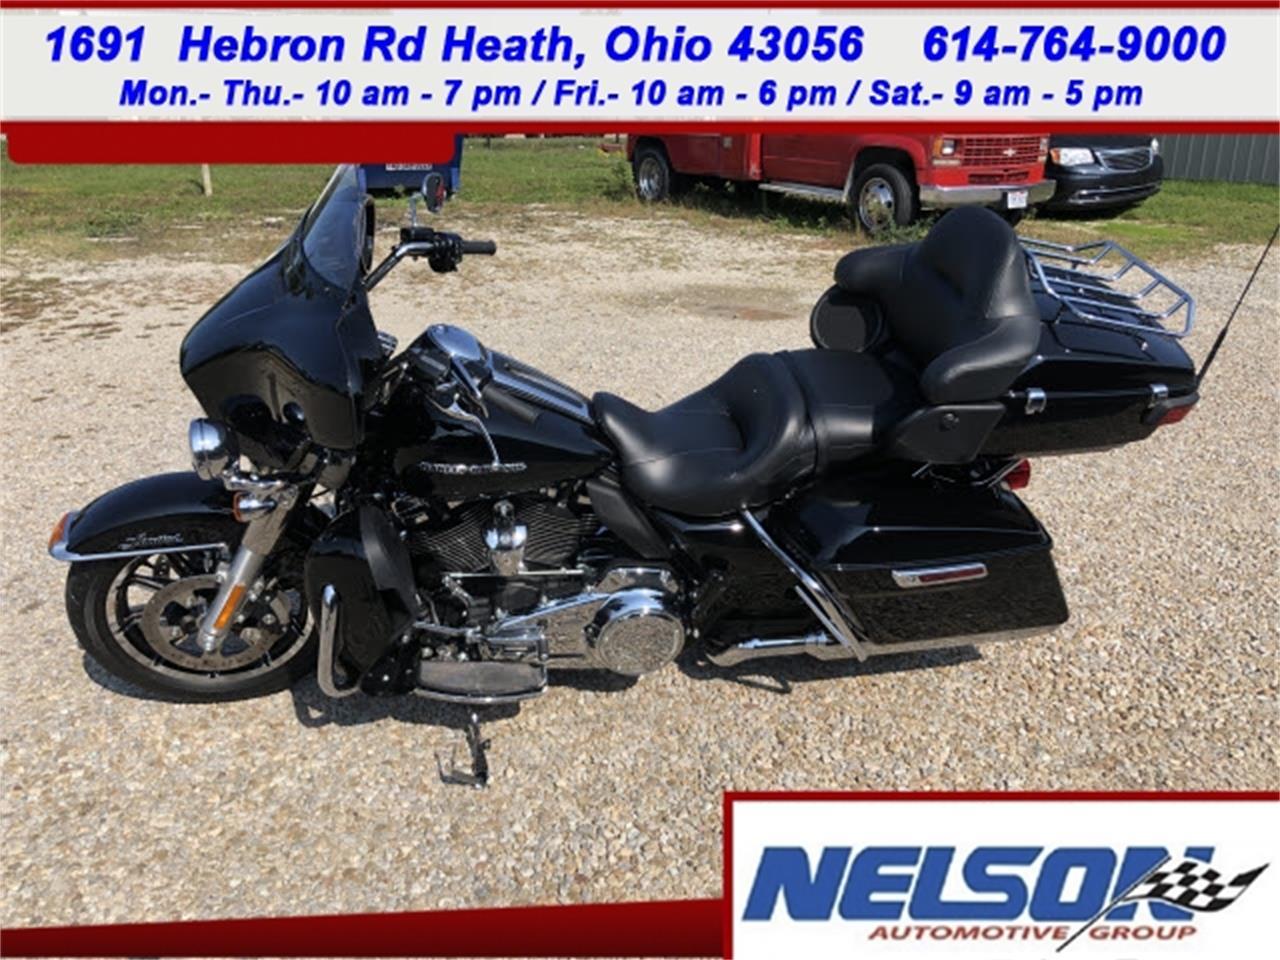 2018 Harley-Davidson Electra Glide (CC-1413524) for sale in Marysville, Ohio